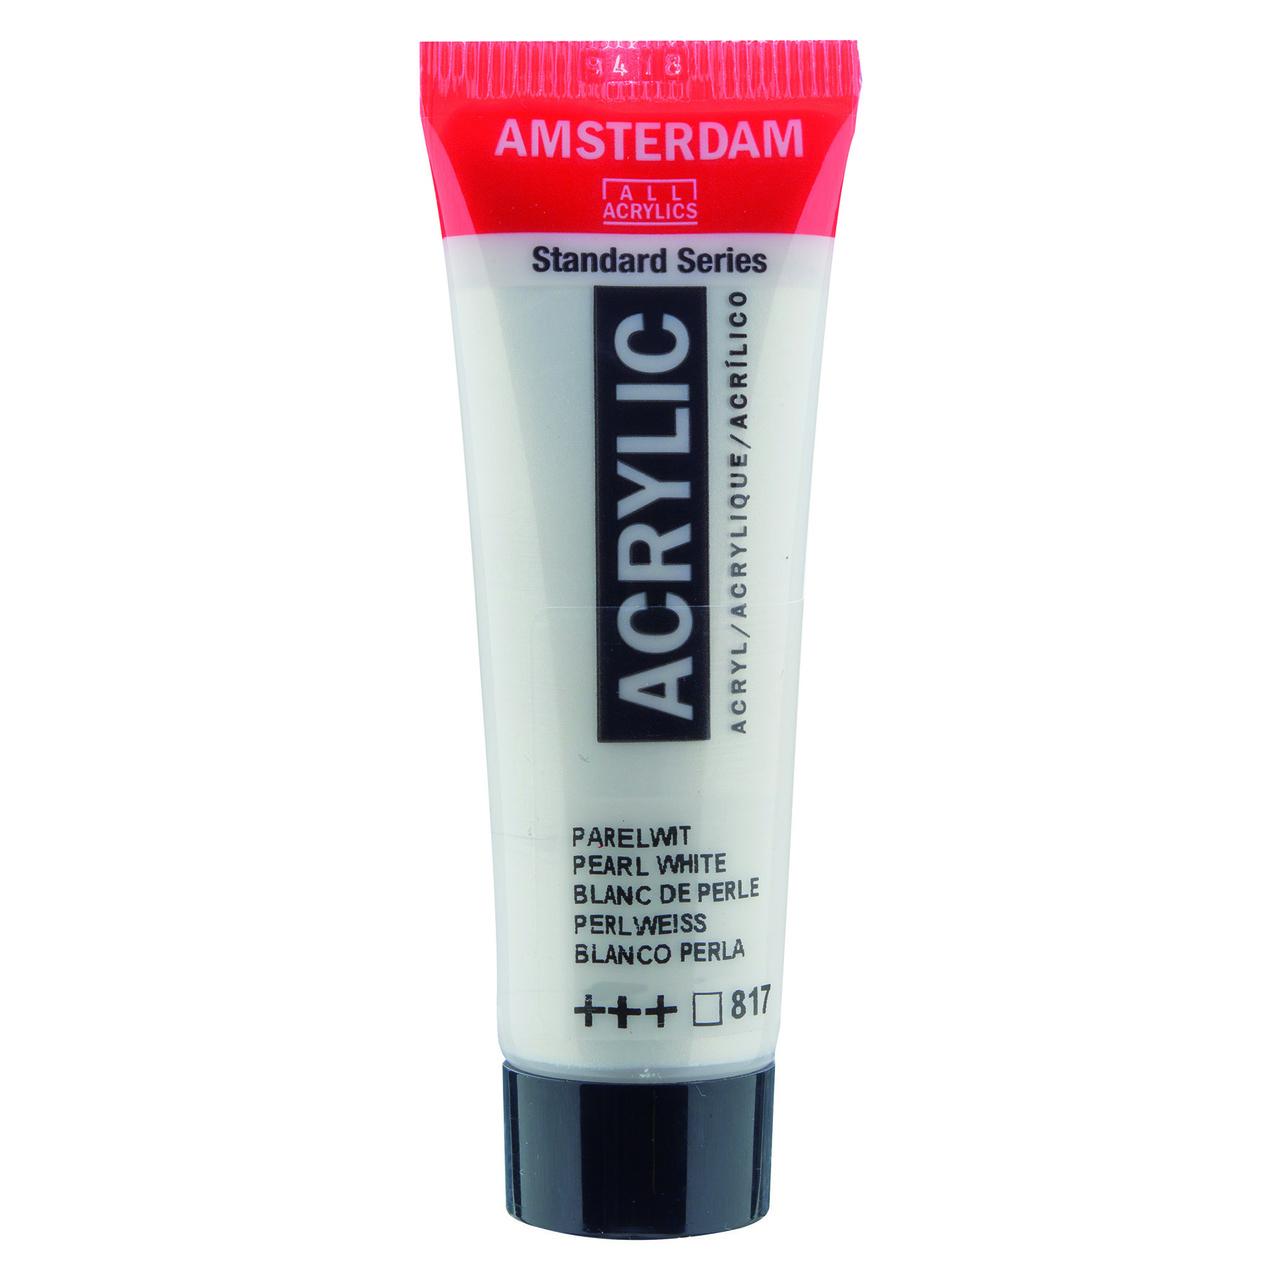 AMSTERDAM ACRYLIC 20ML PEARL WHITE